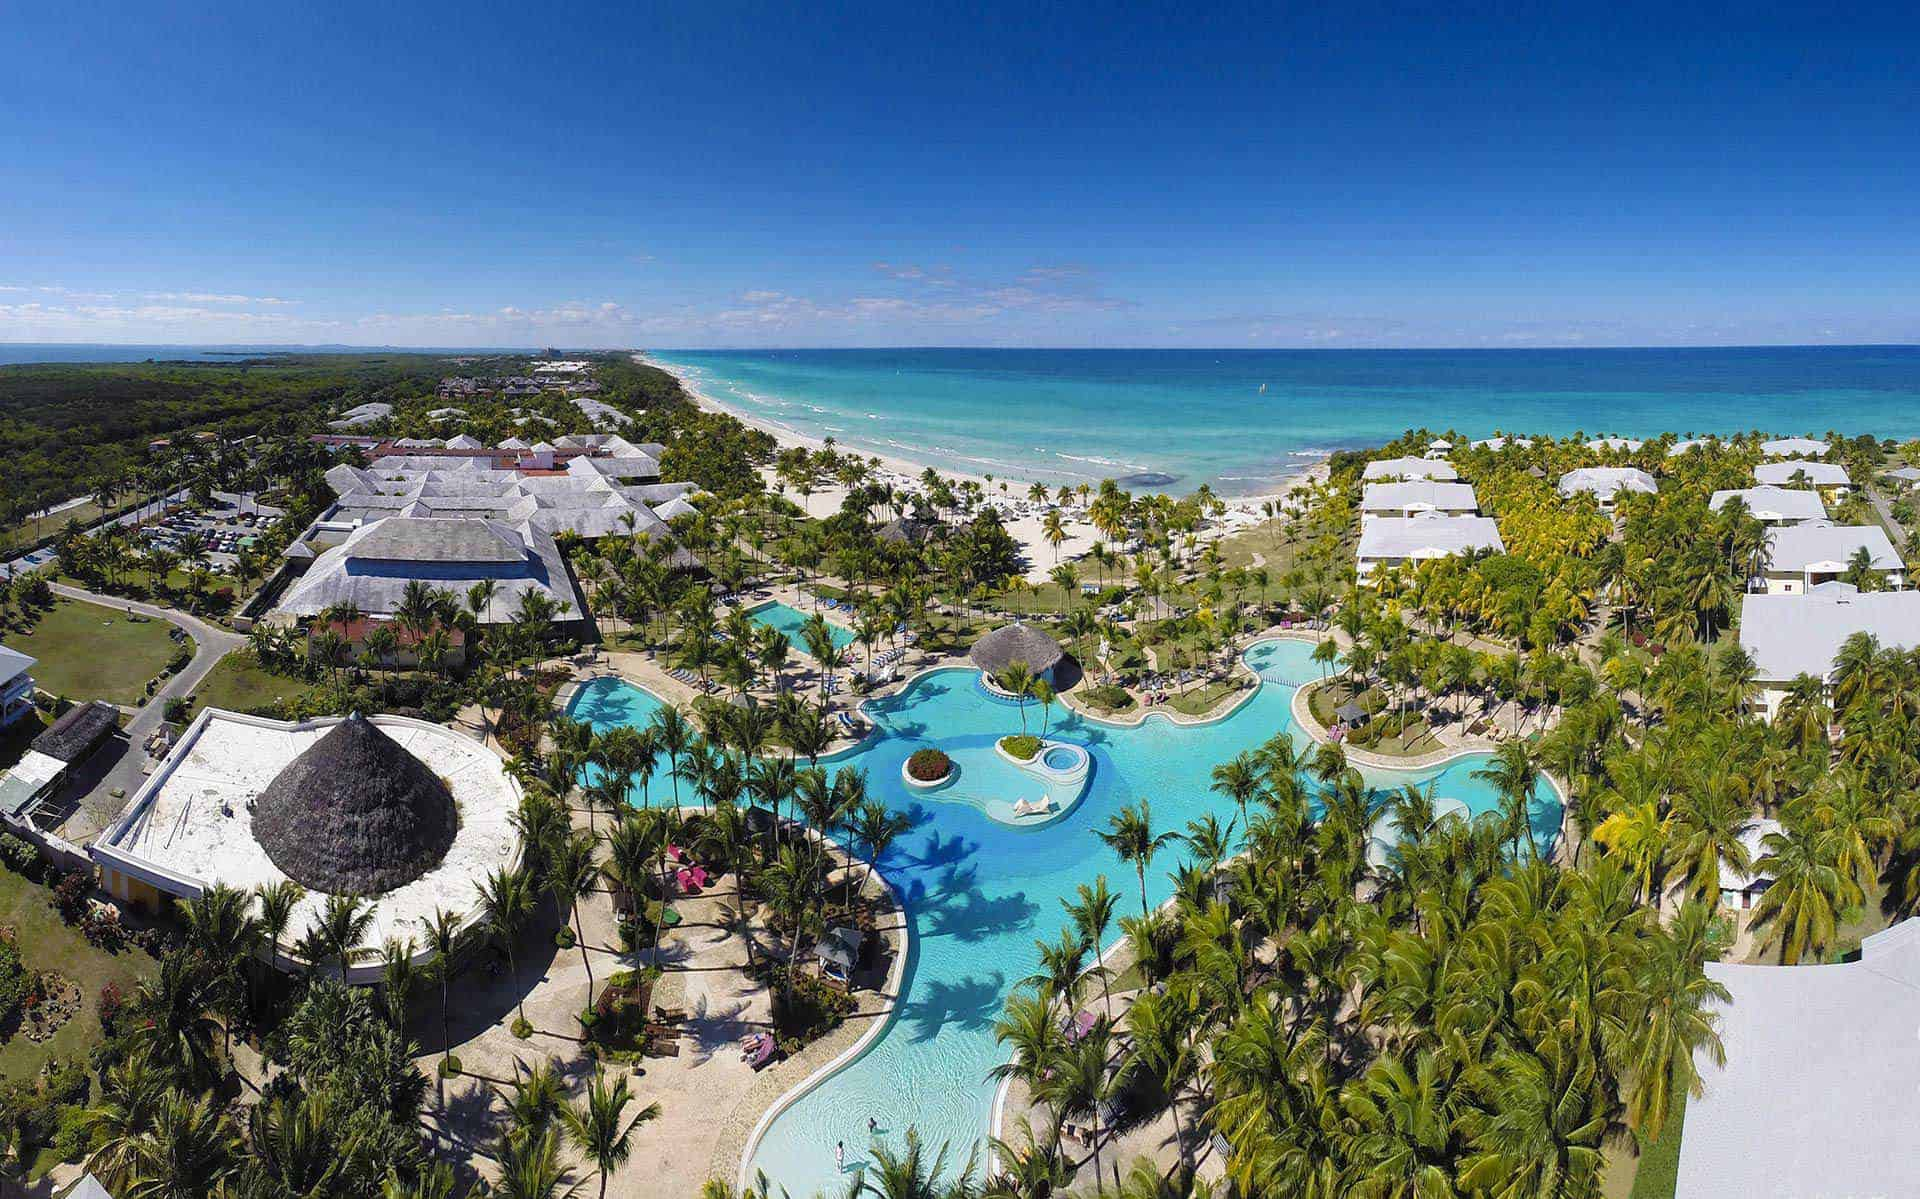 varadero hotel piscine plage mer cuba autrement 2